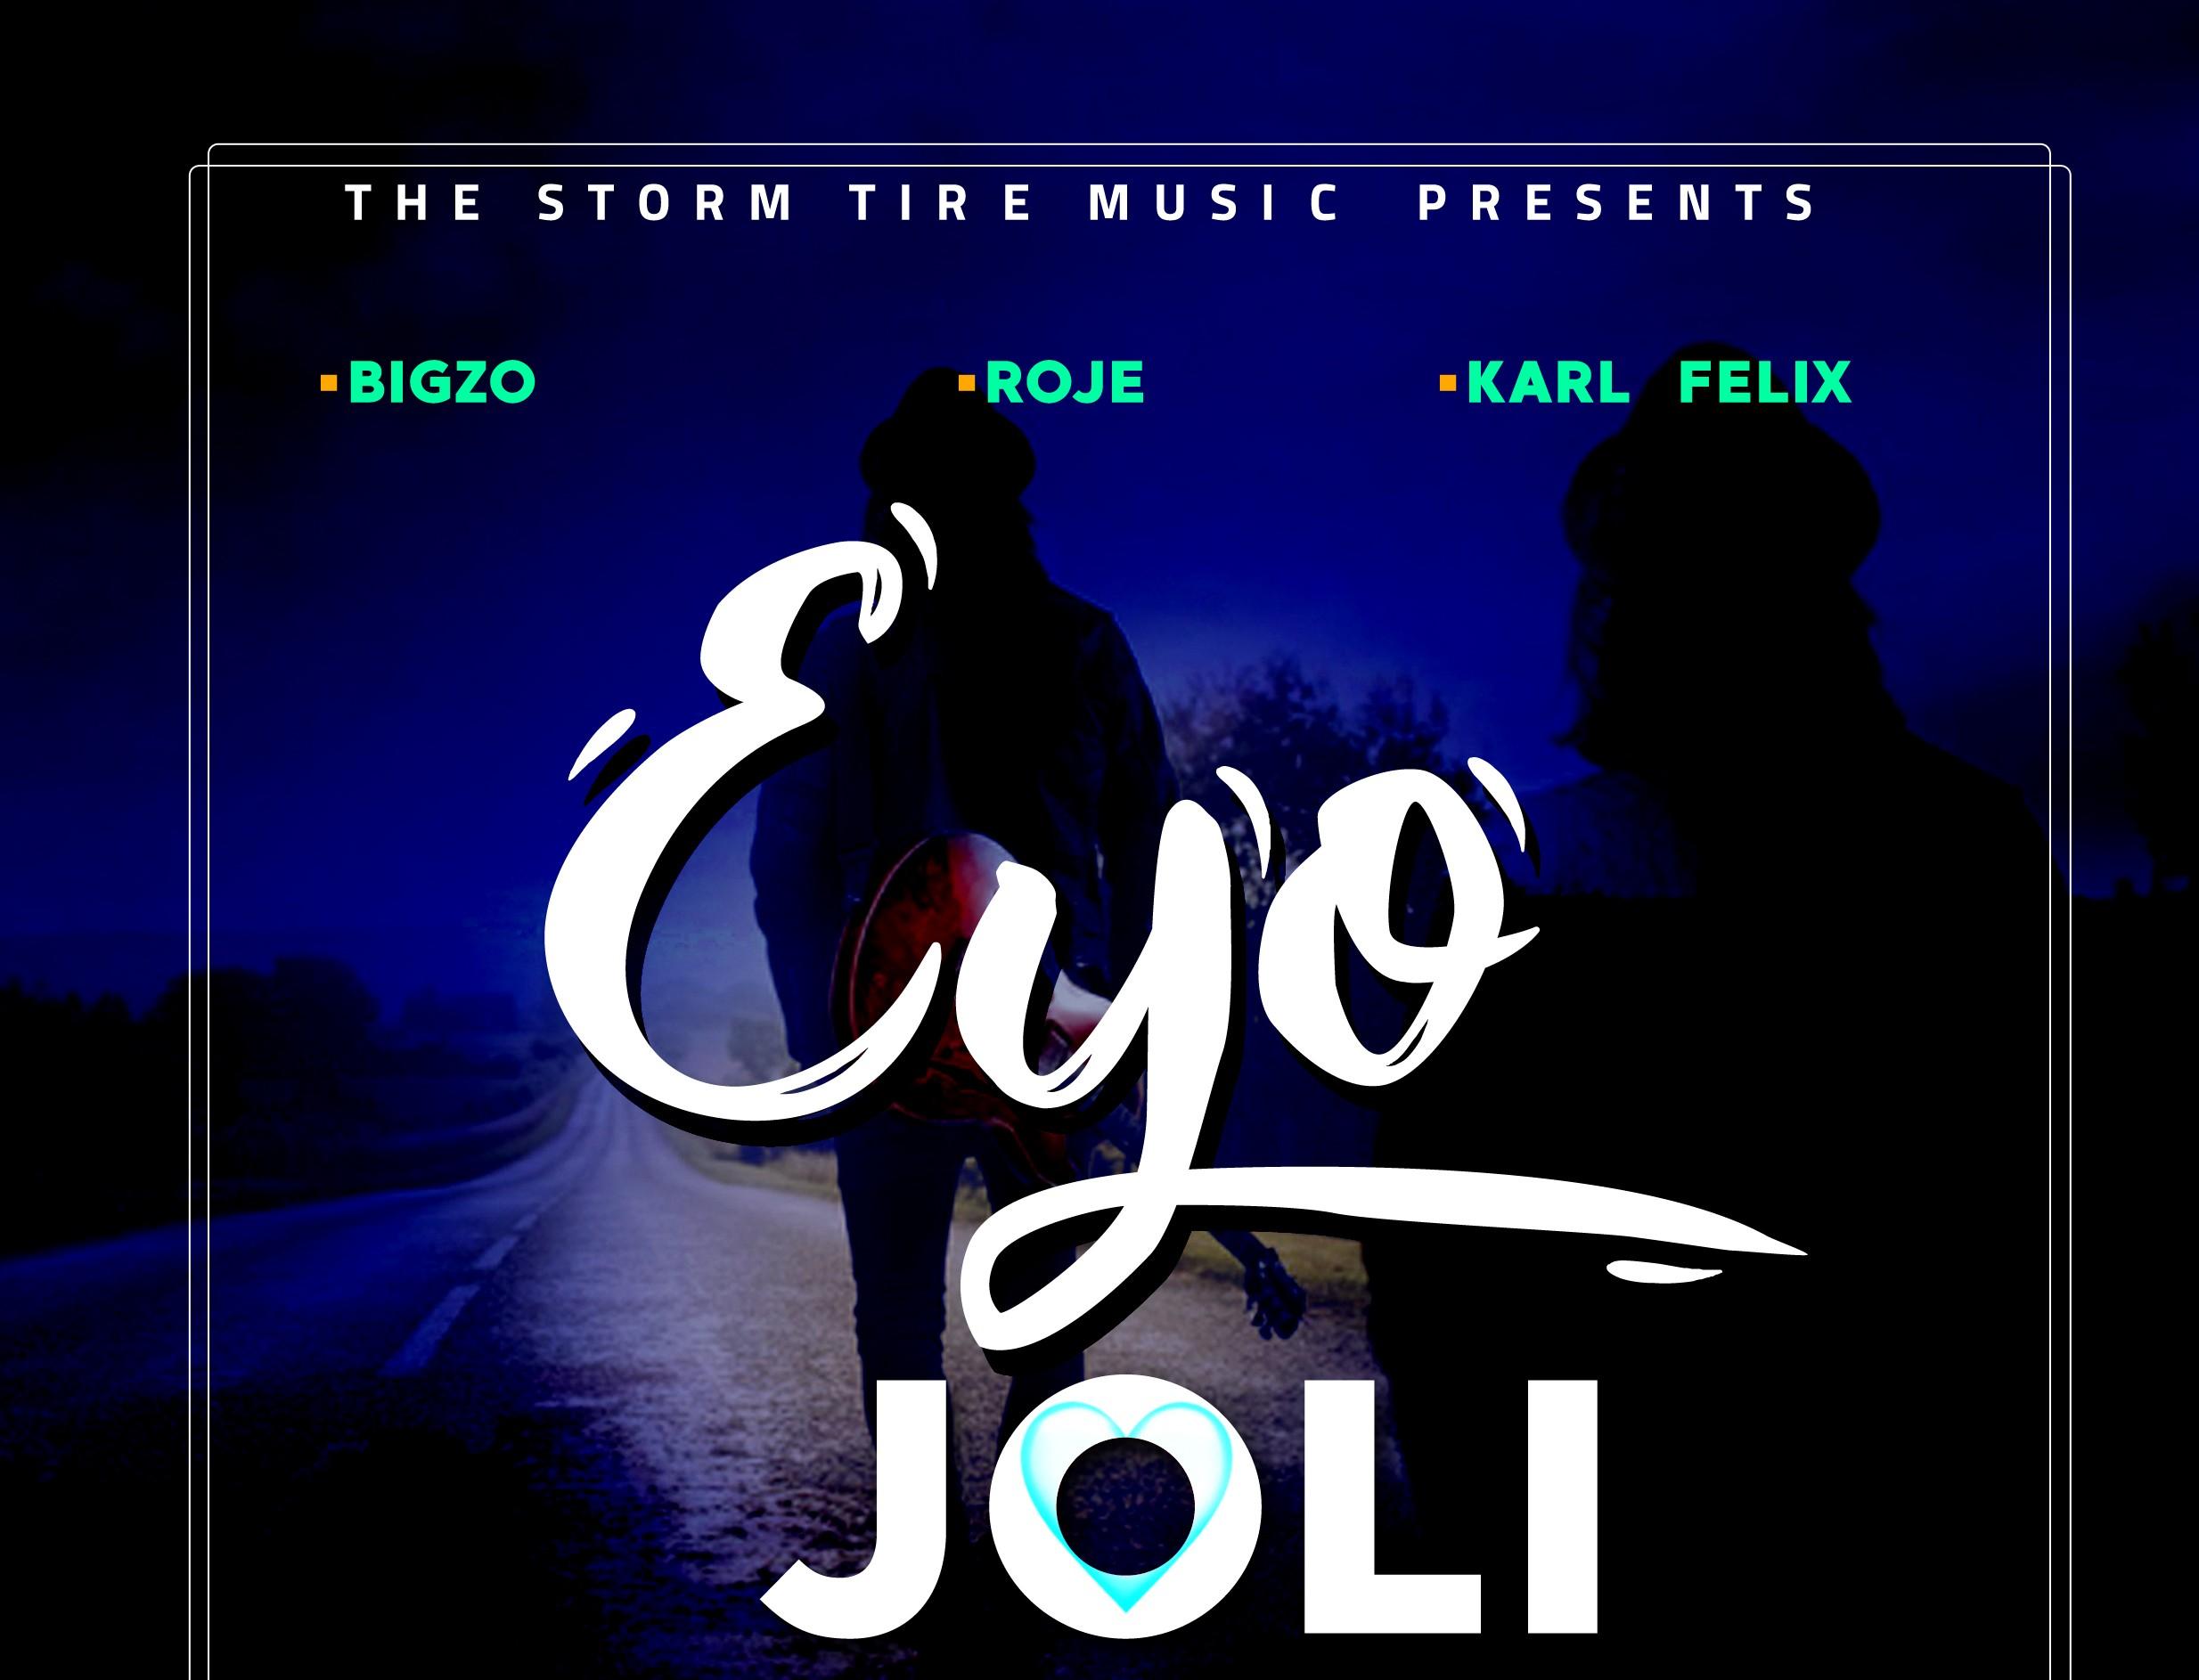 Eyo Joli by TST ug (bigzo en roje)ft Karl felix